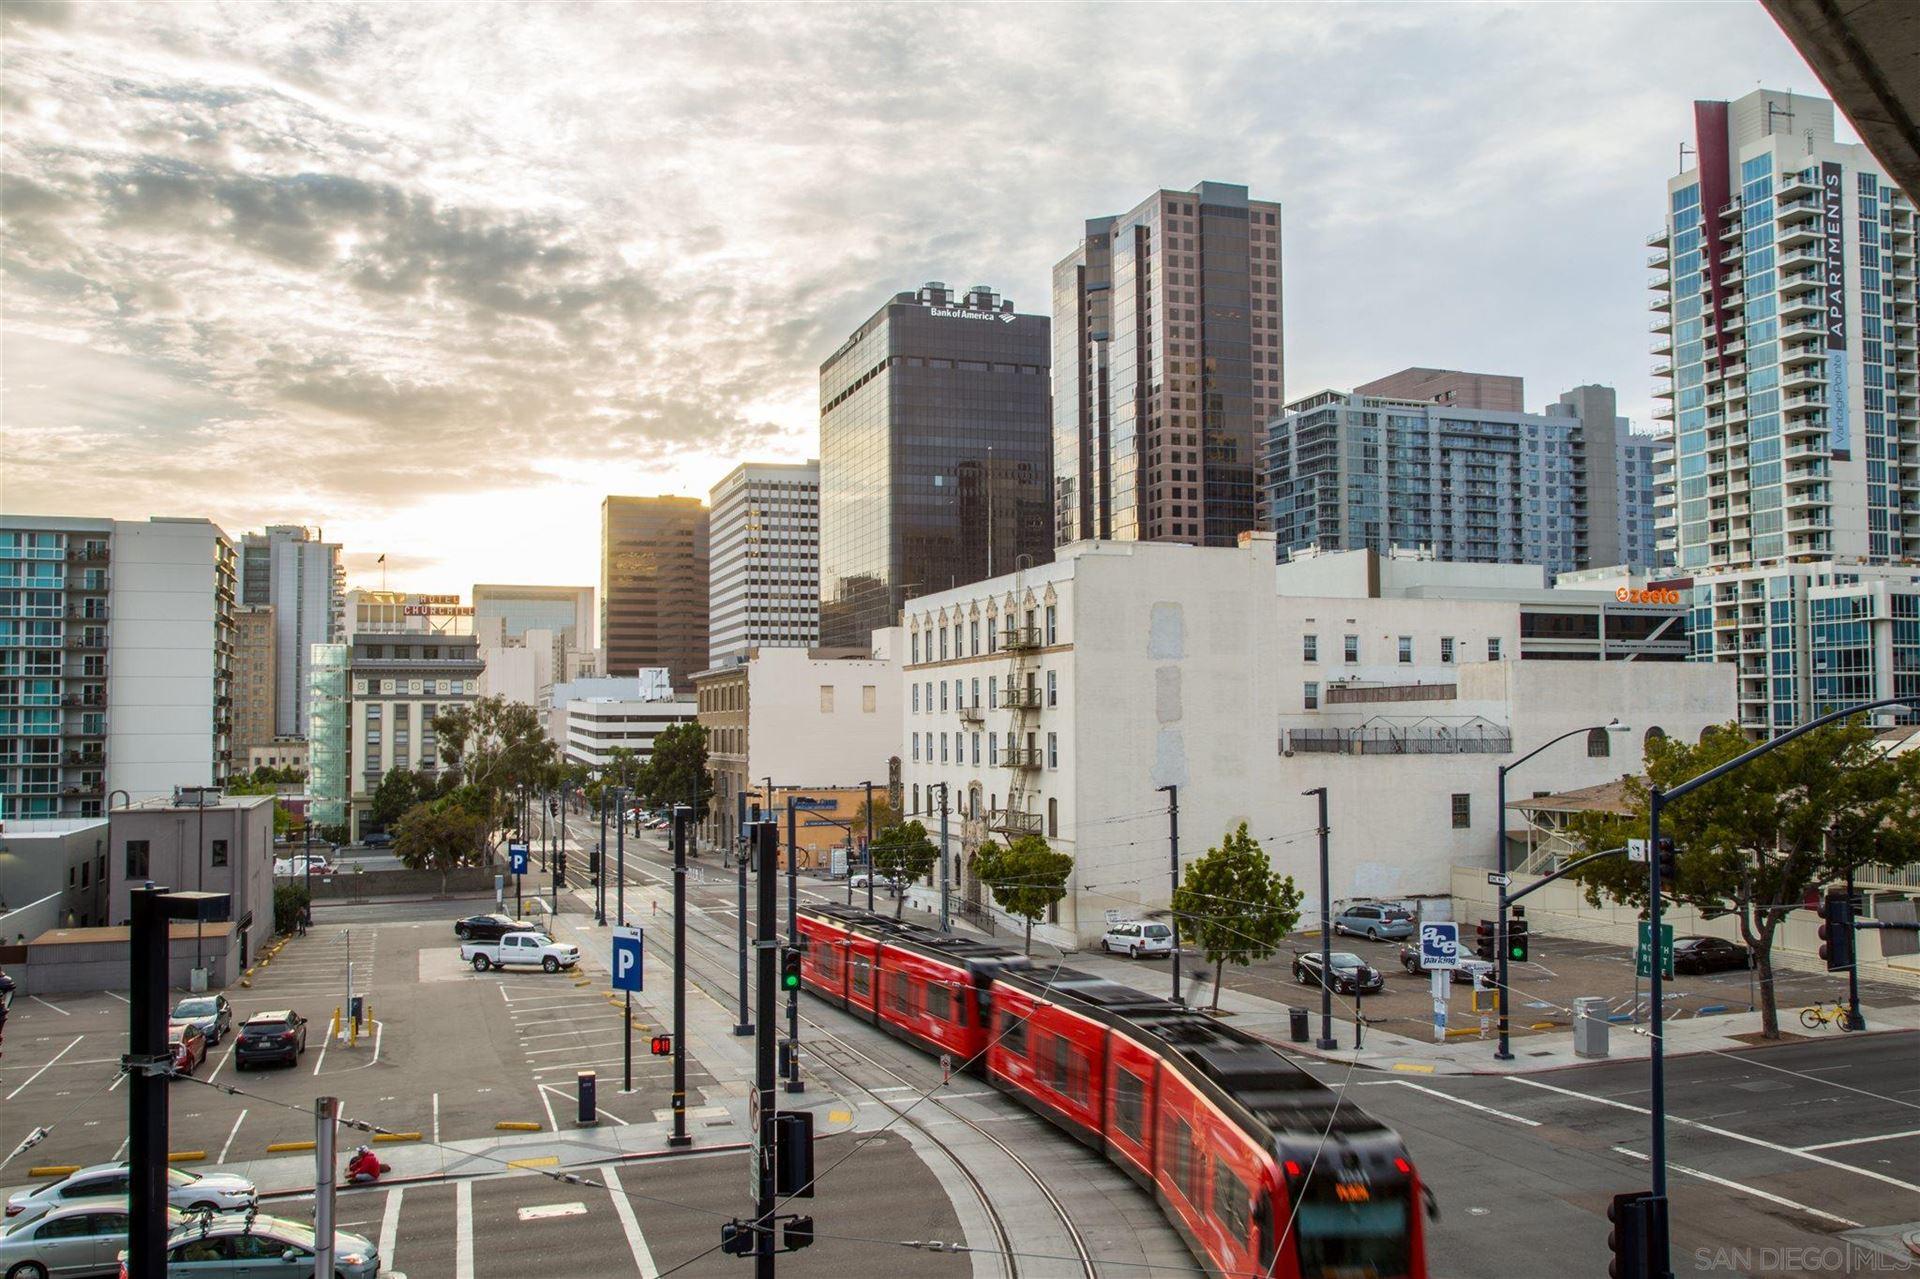 Photo for 1080 Park Blvd #301, San Diego, CA 92101 (MLS # 210001169)